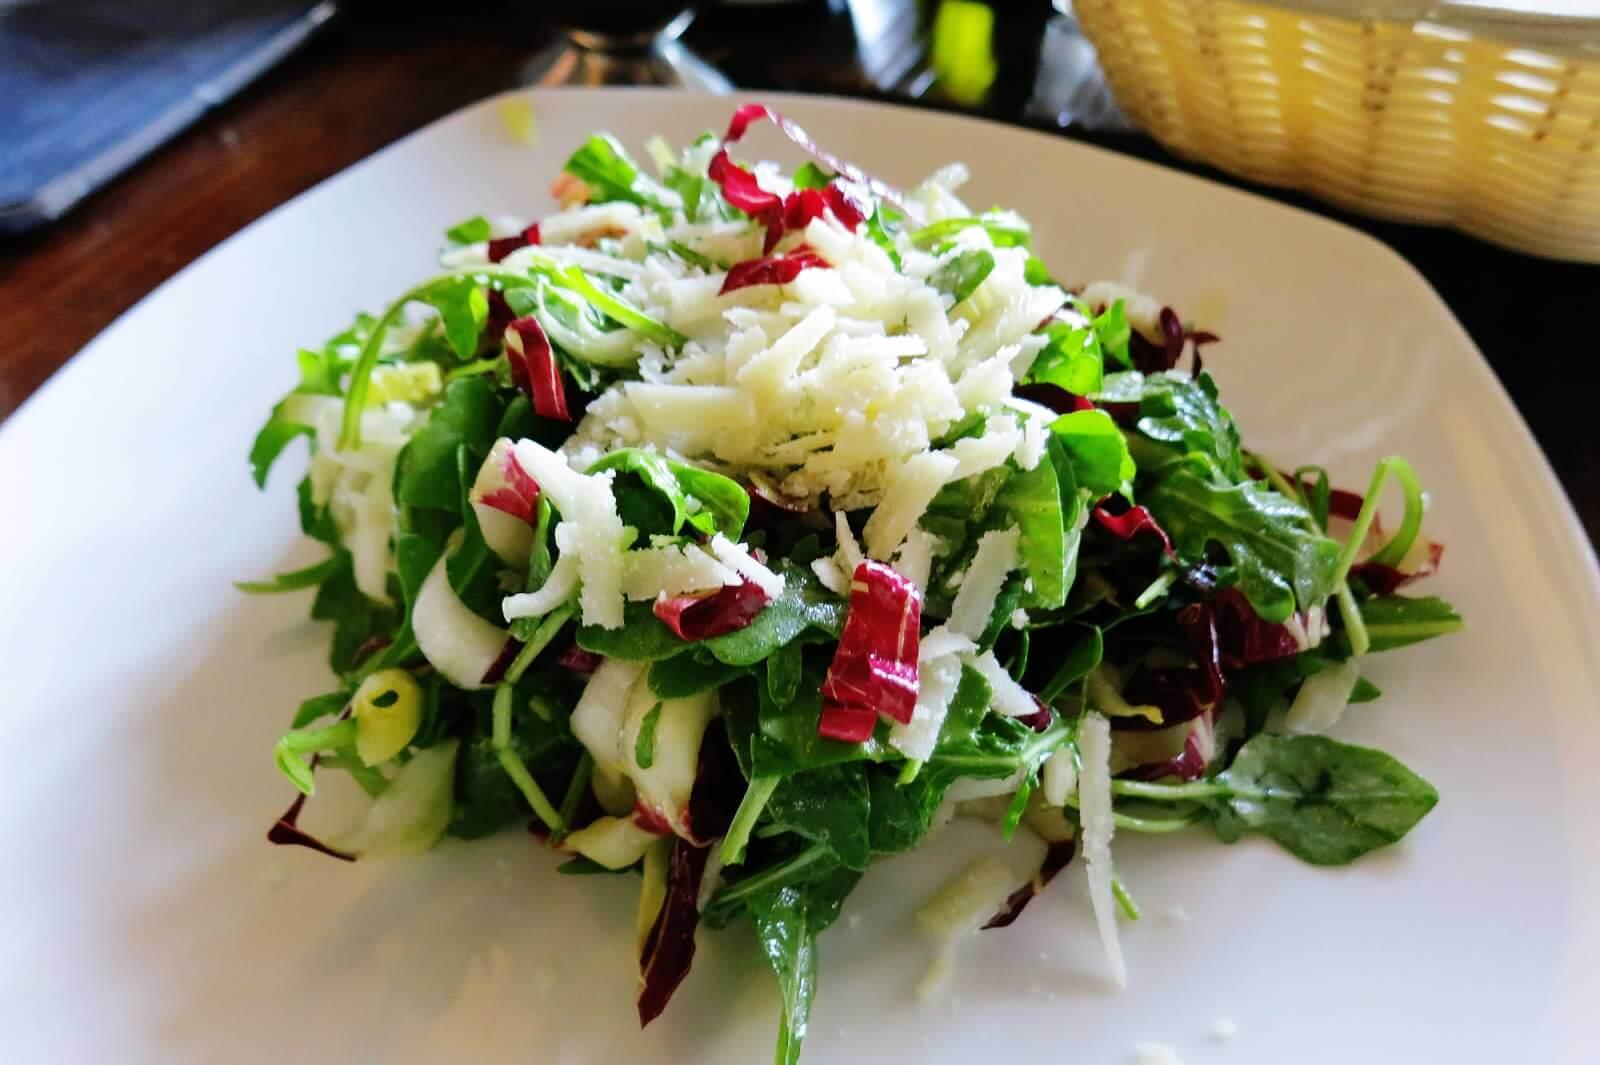 Tre Colori Salad--Treviso radicchio, Belgian endive, baby wild arugula, aged Grana Padano